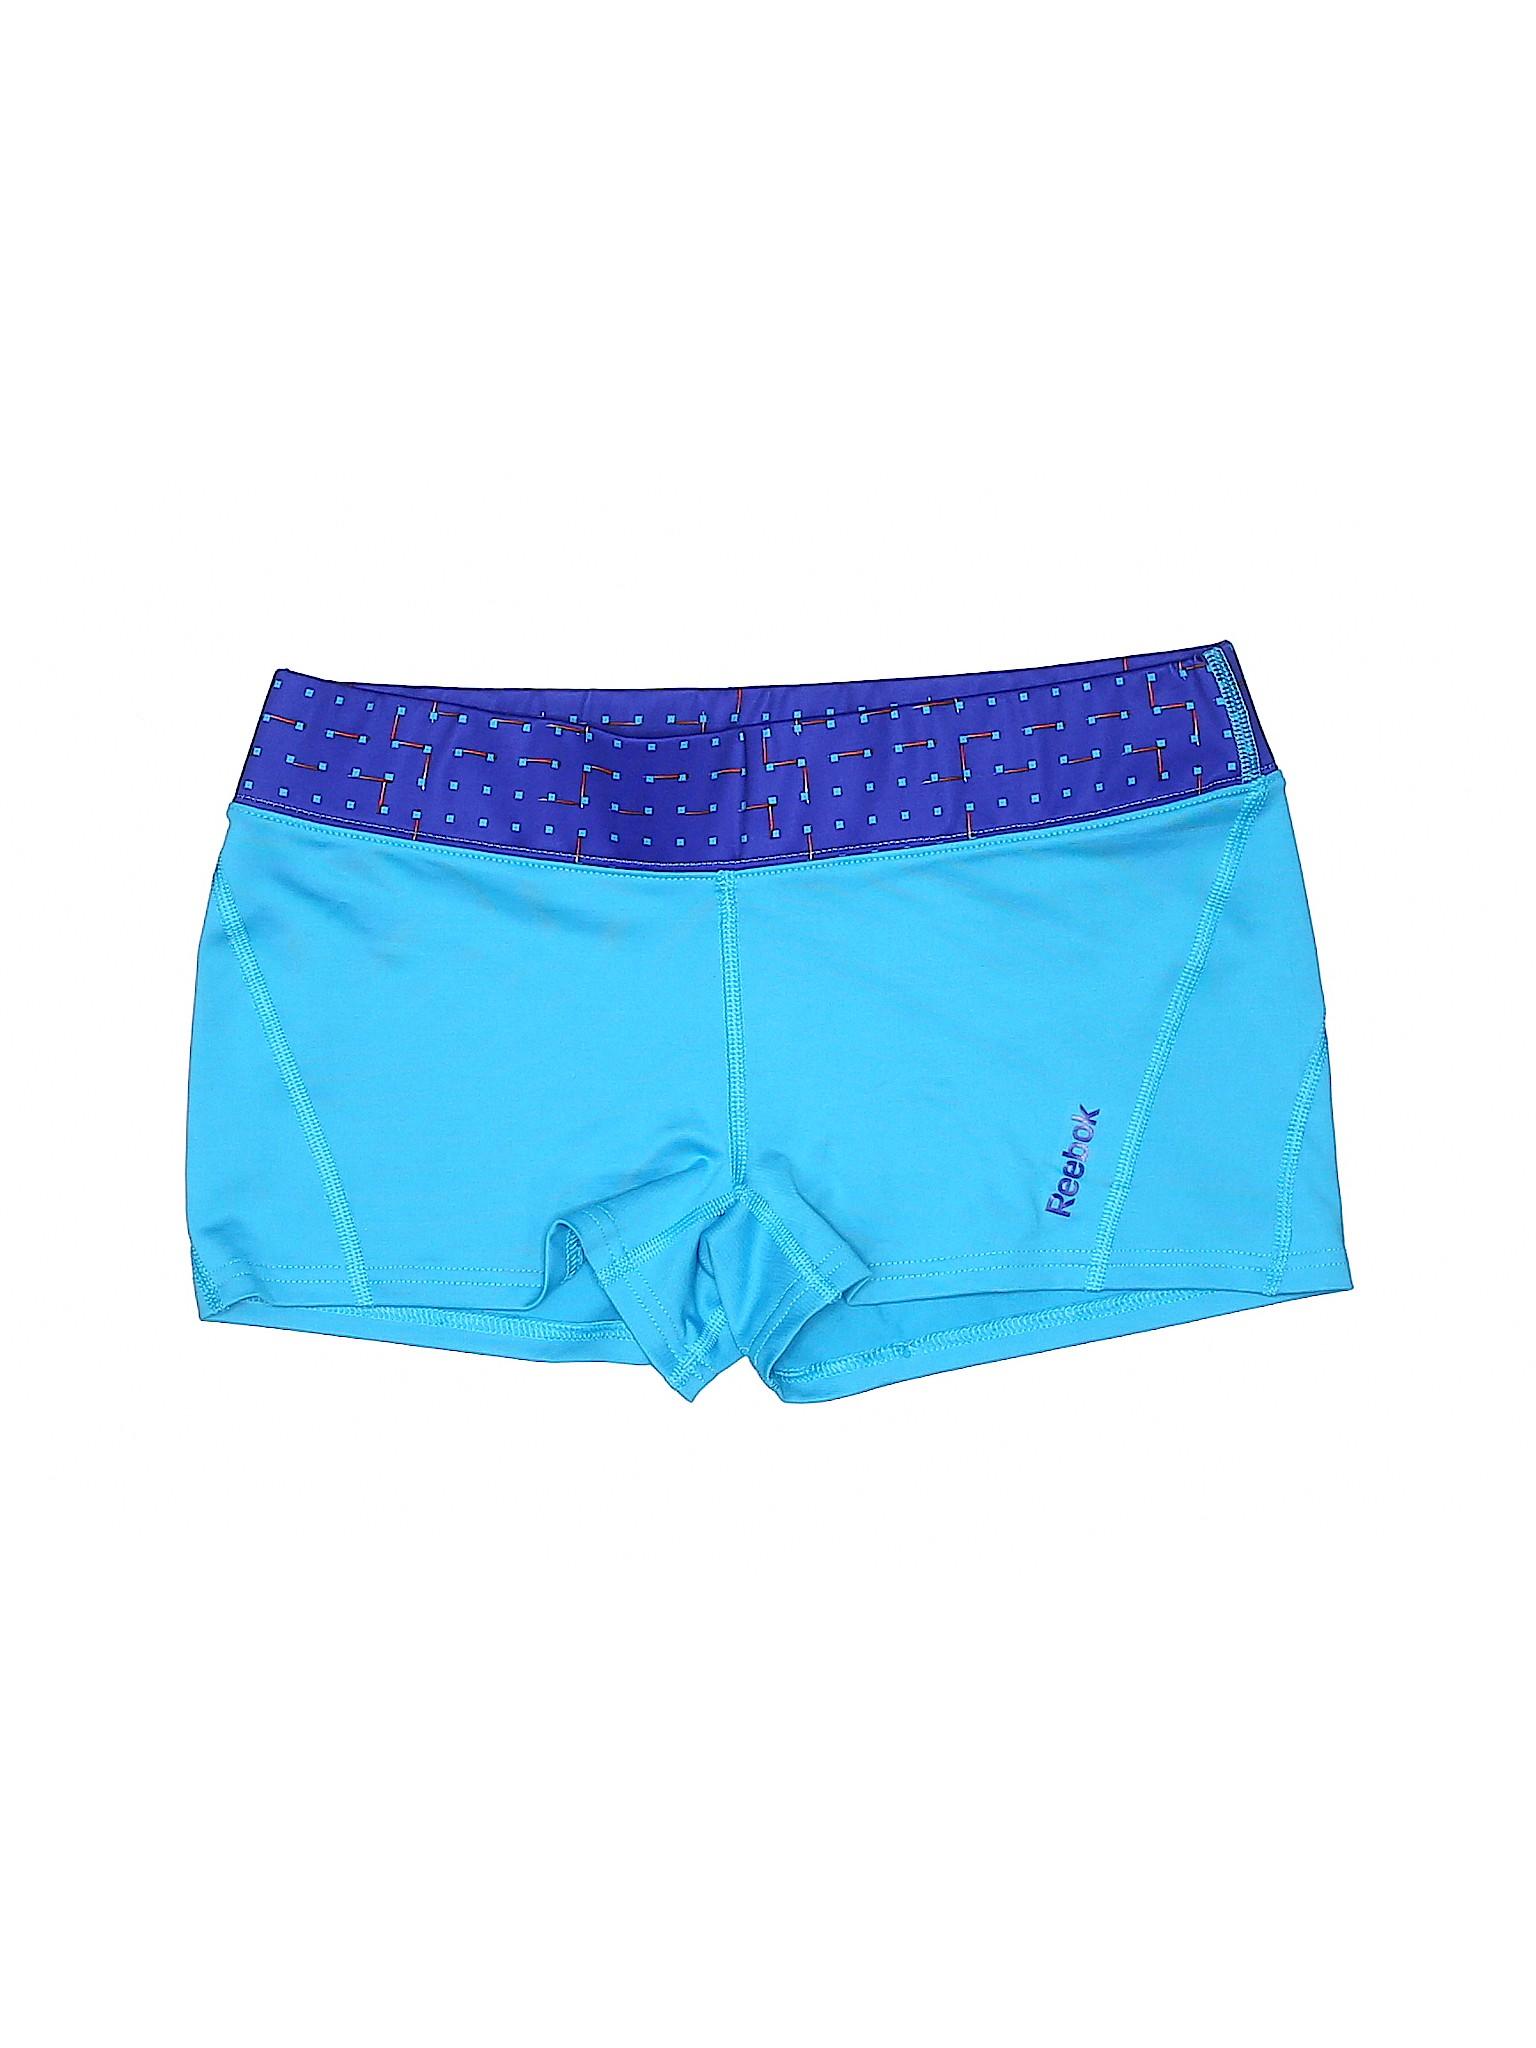 Boutique leisure Boutique Reebok Shorts leisure Athletic wqYHFqv8